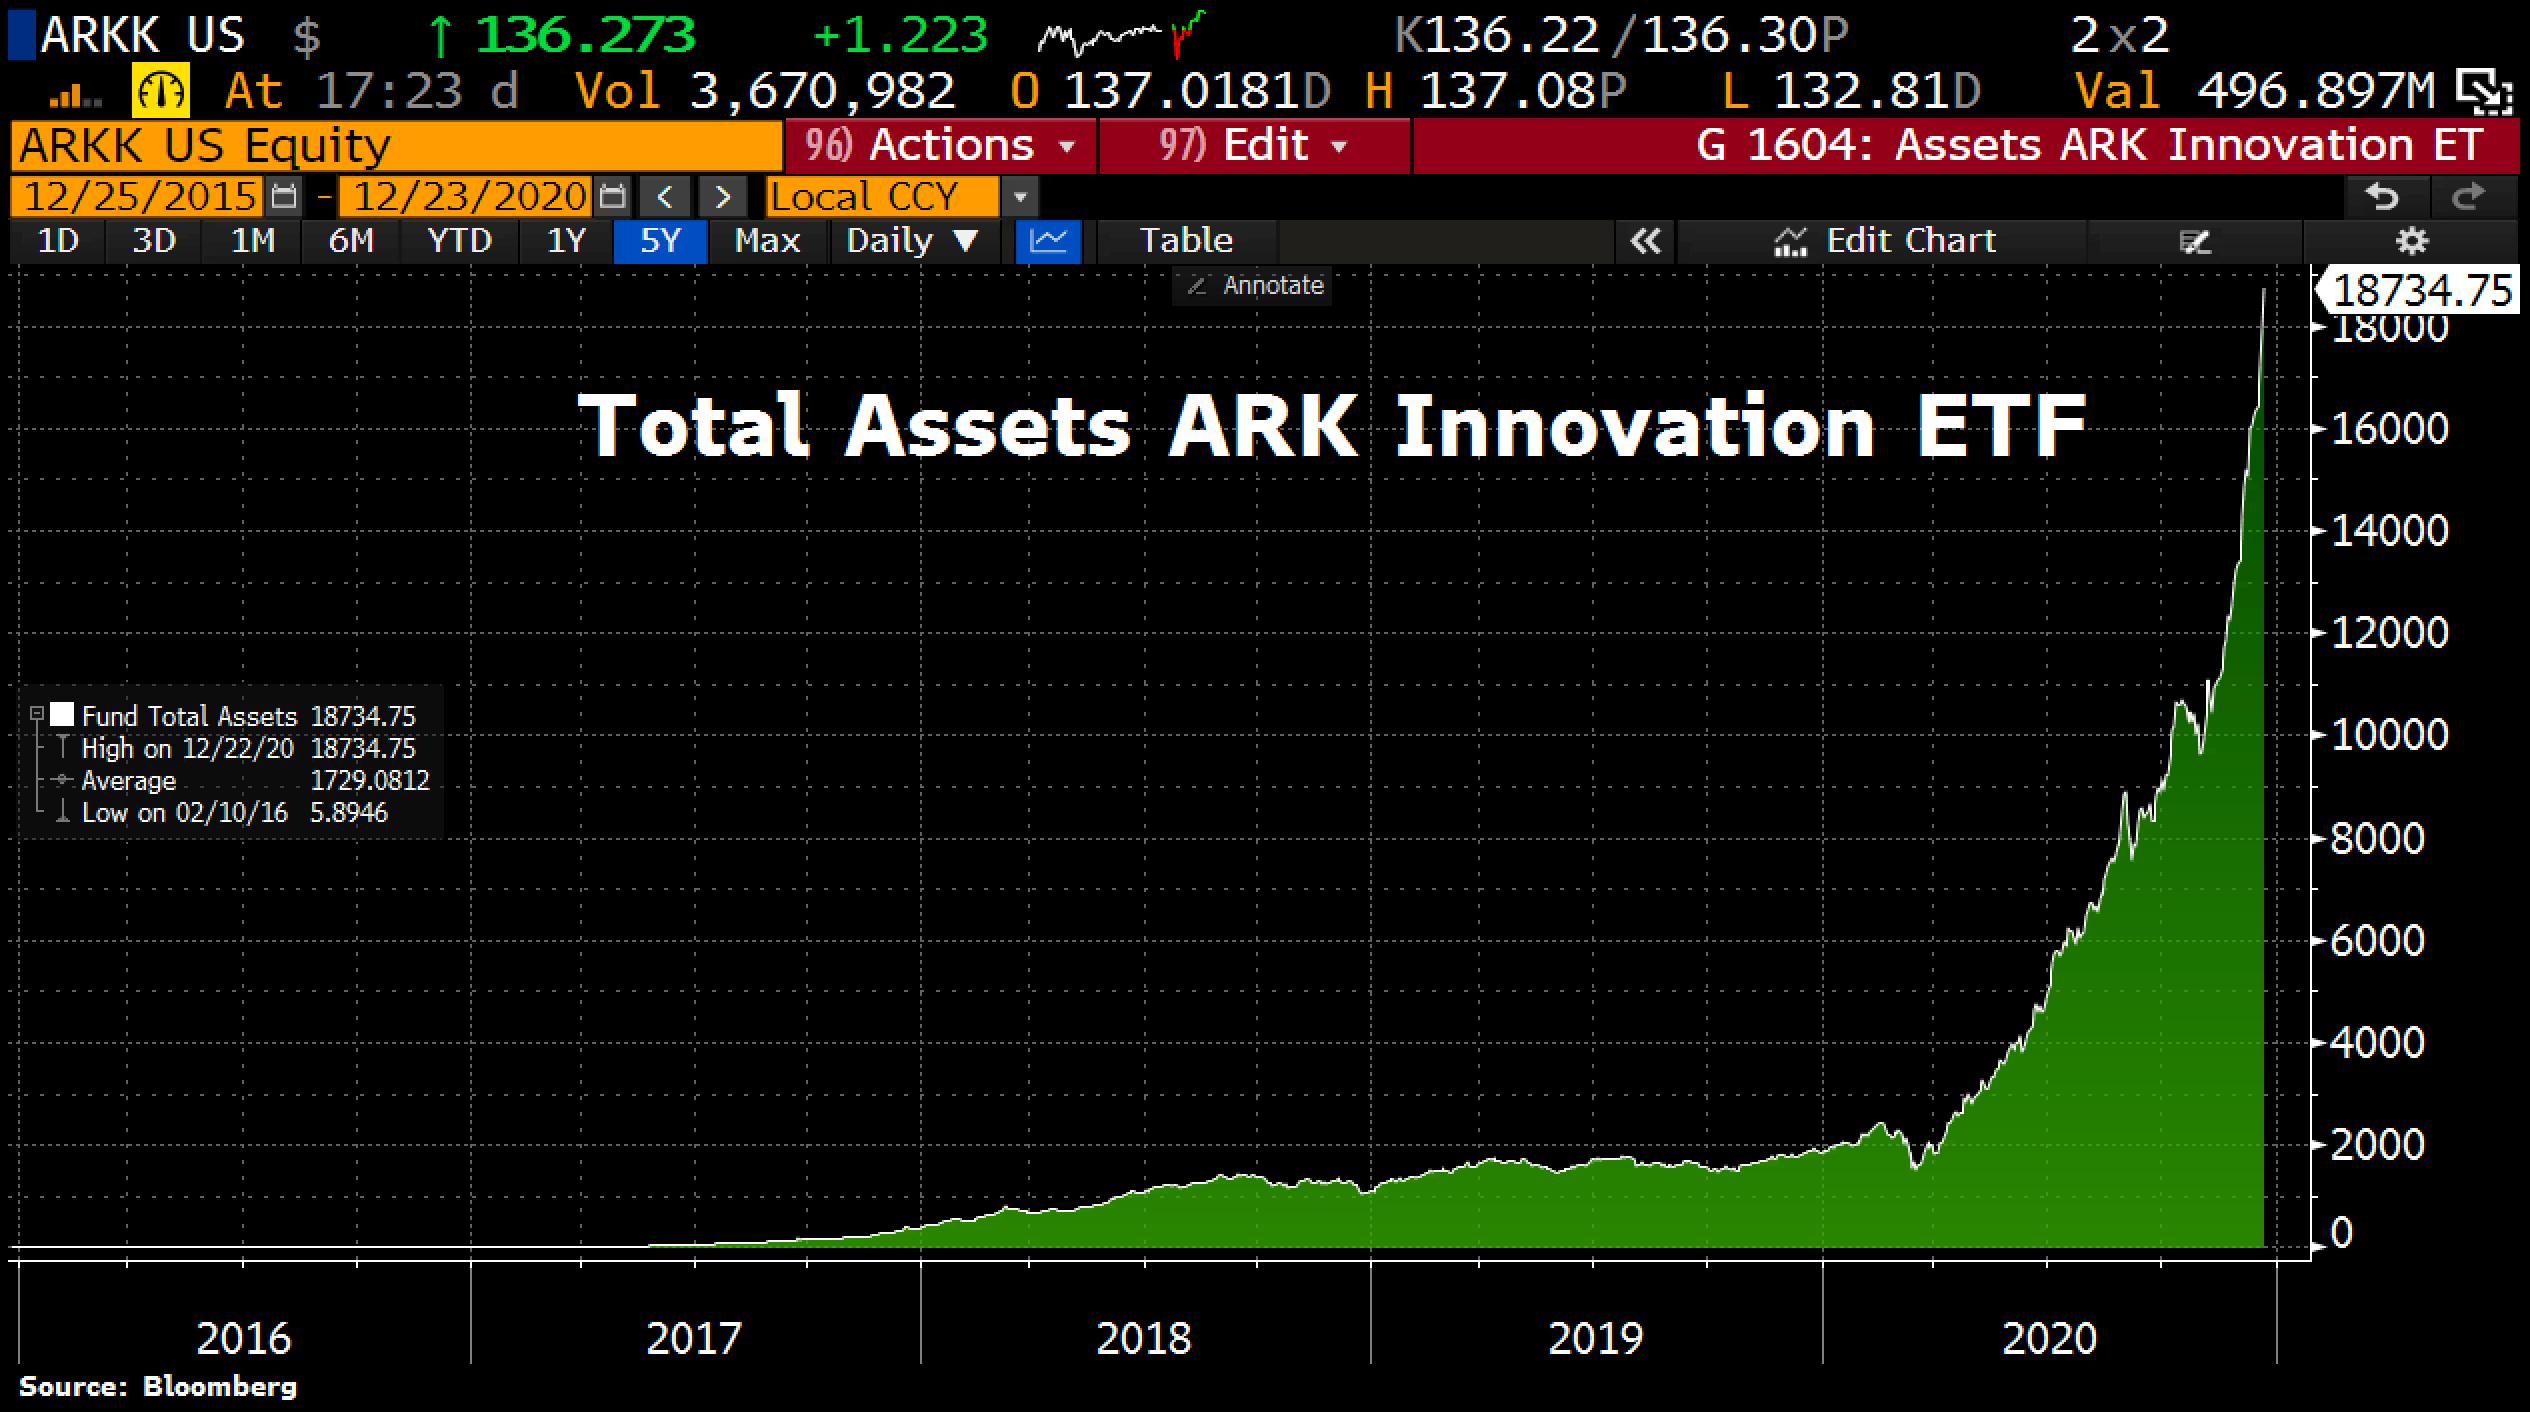 ark etf assets